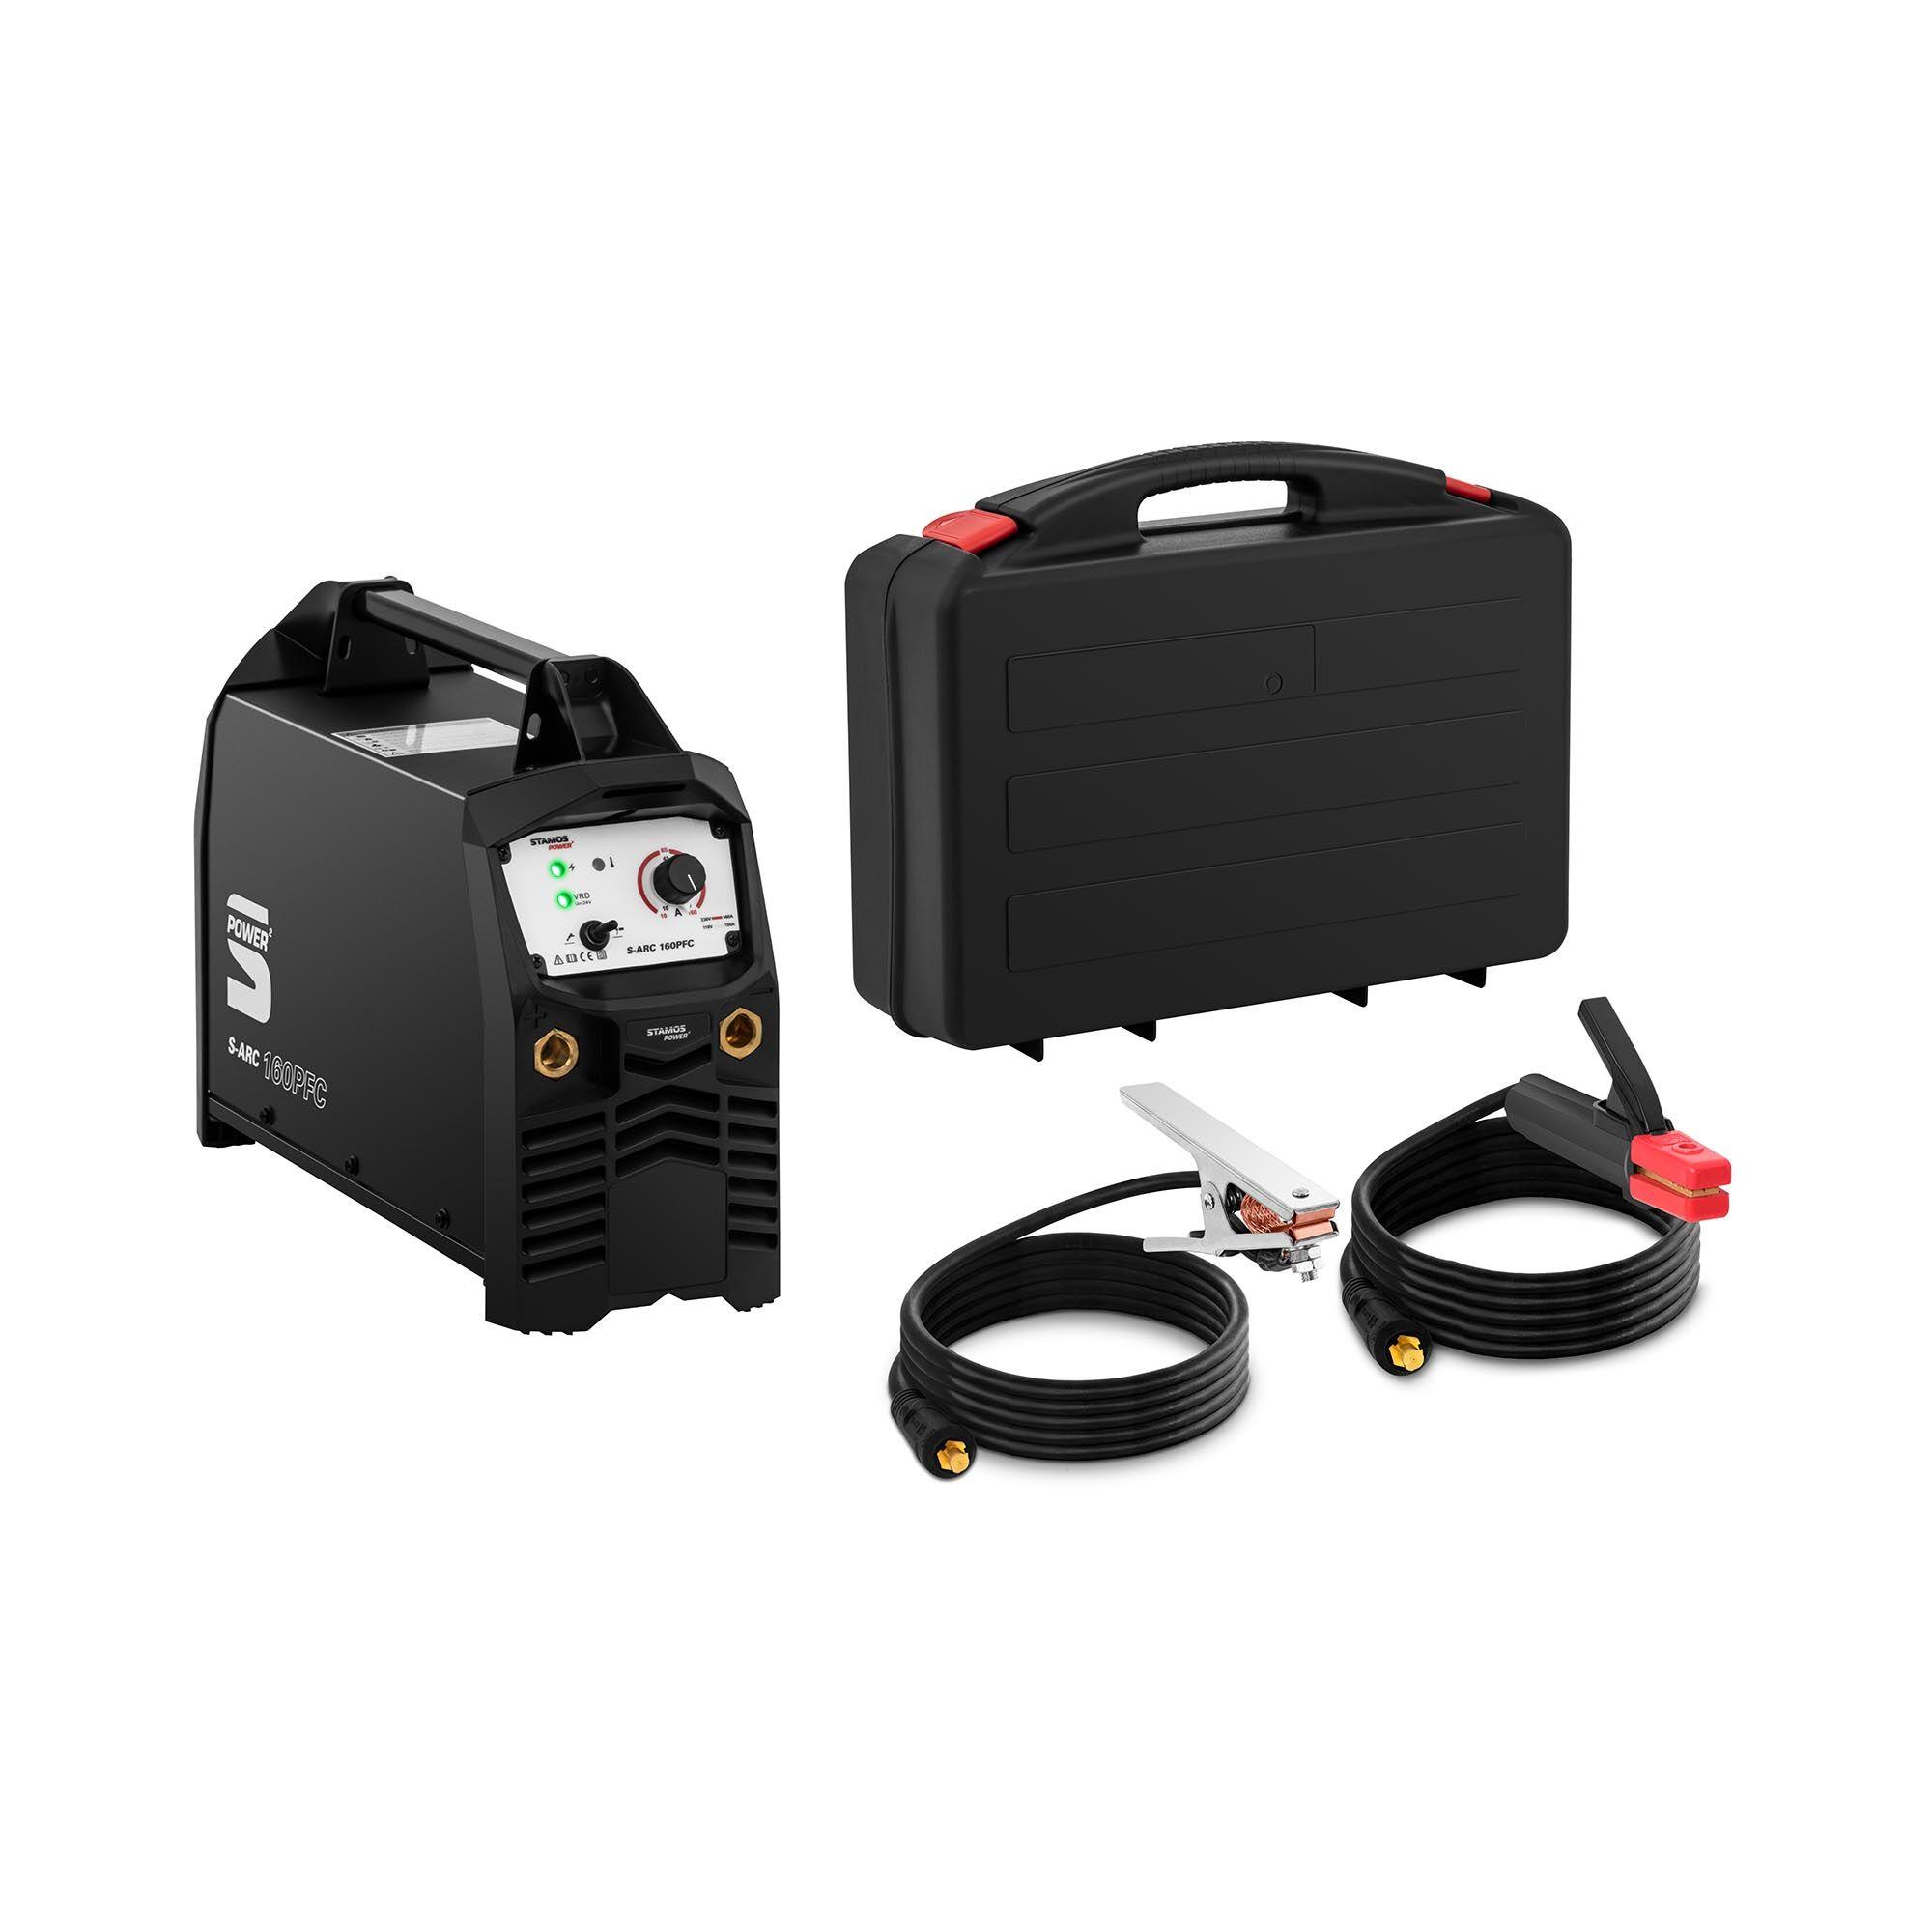 stamos power ² saldatrice mma - 160 a - tig liftarc - generatore di corrente compatibile s-arc 160pfc